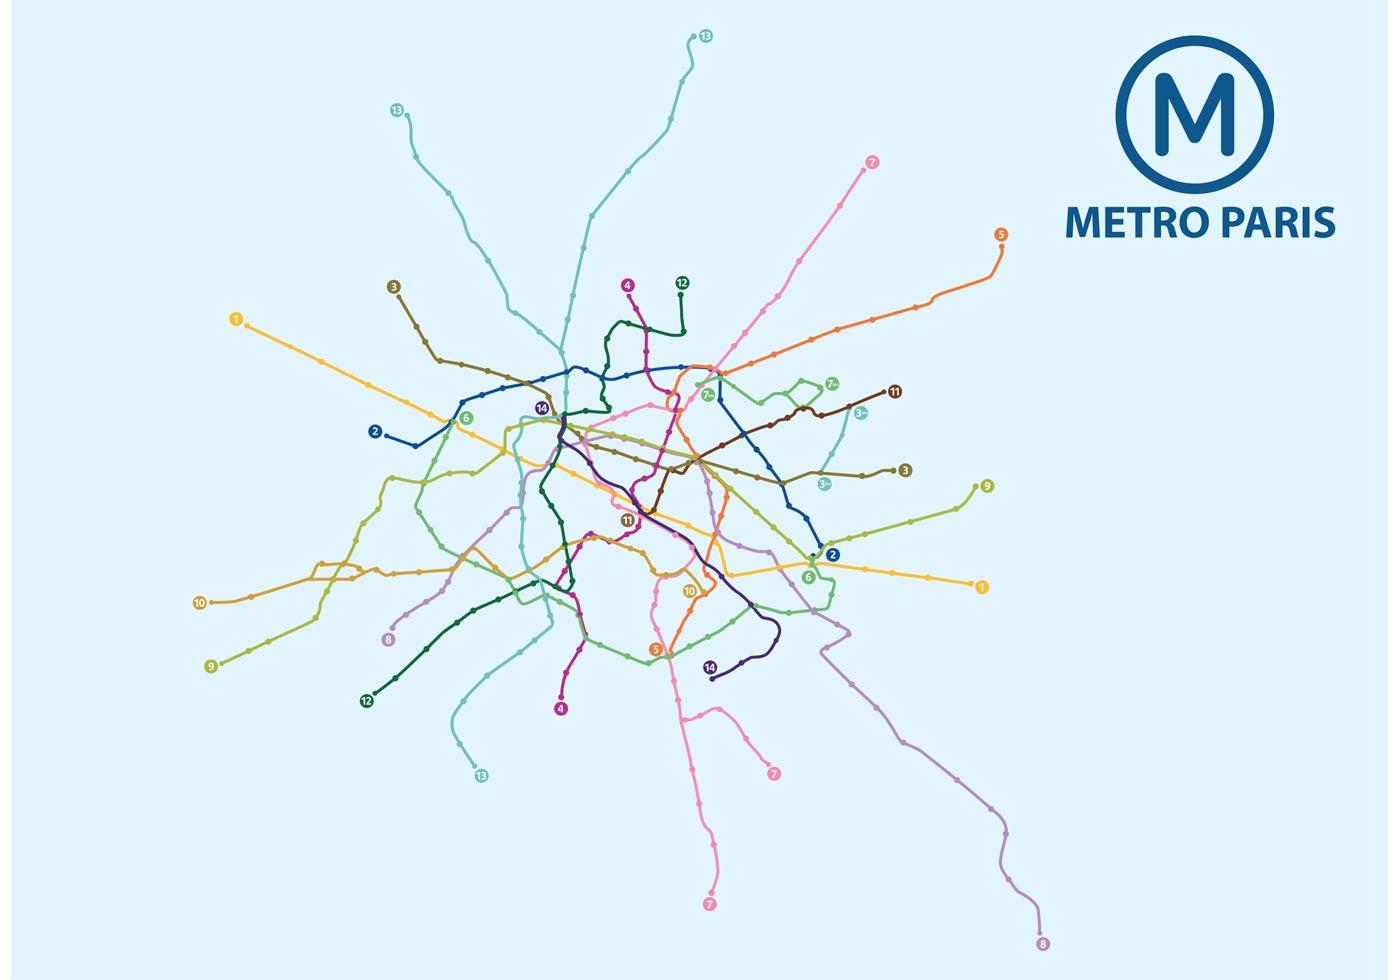 vector venn diagram clarion vrx486vd wiring metro paris map - download free art, stock graphics & images